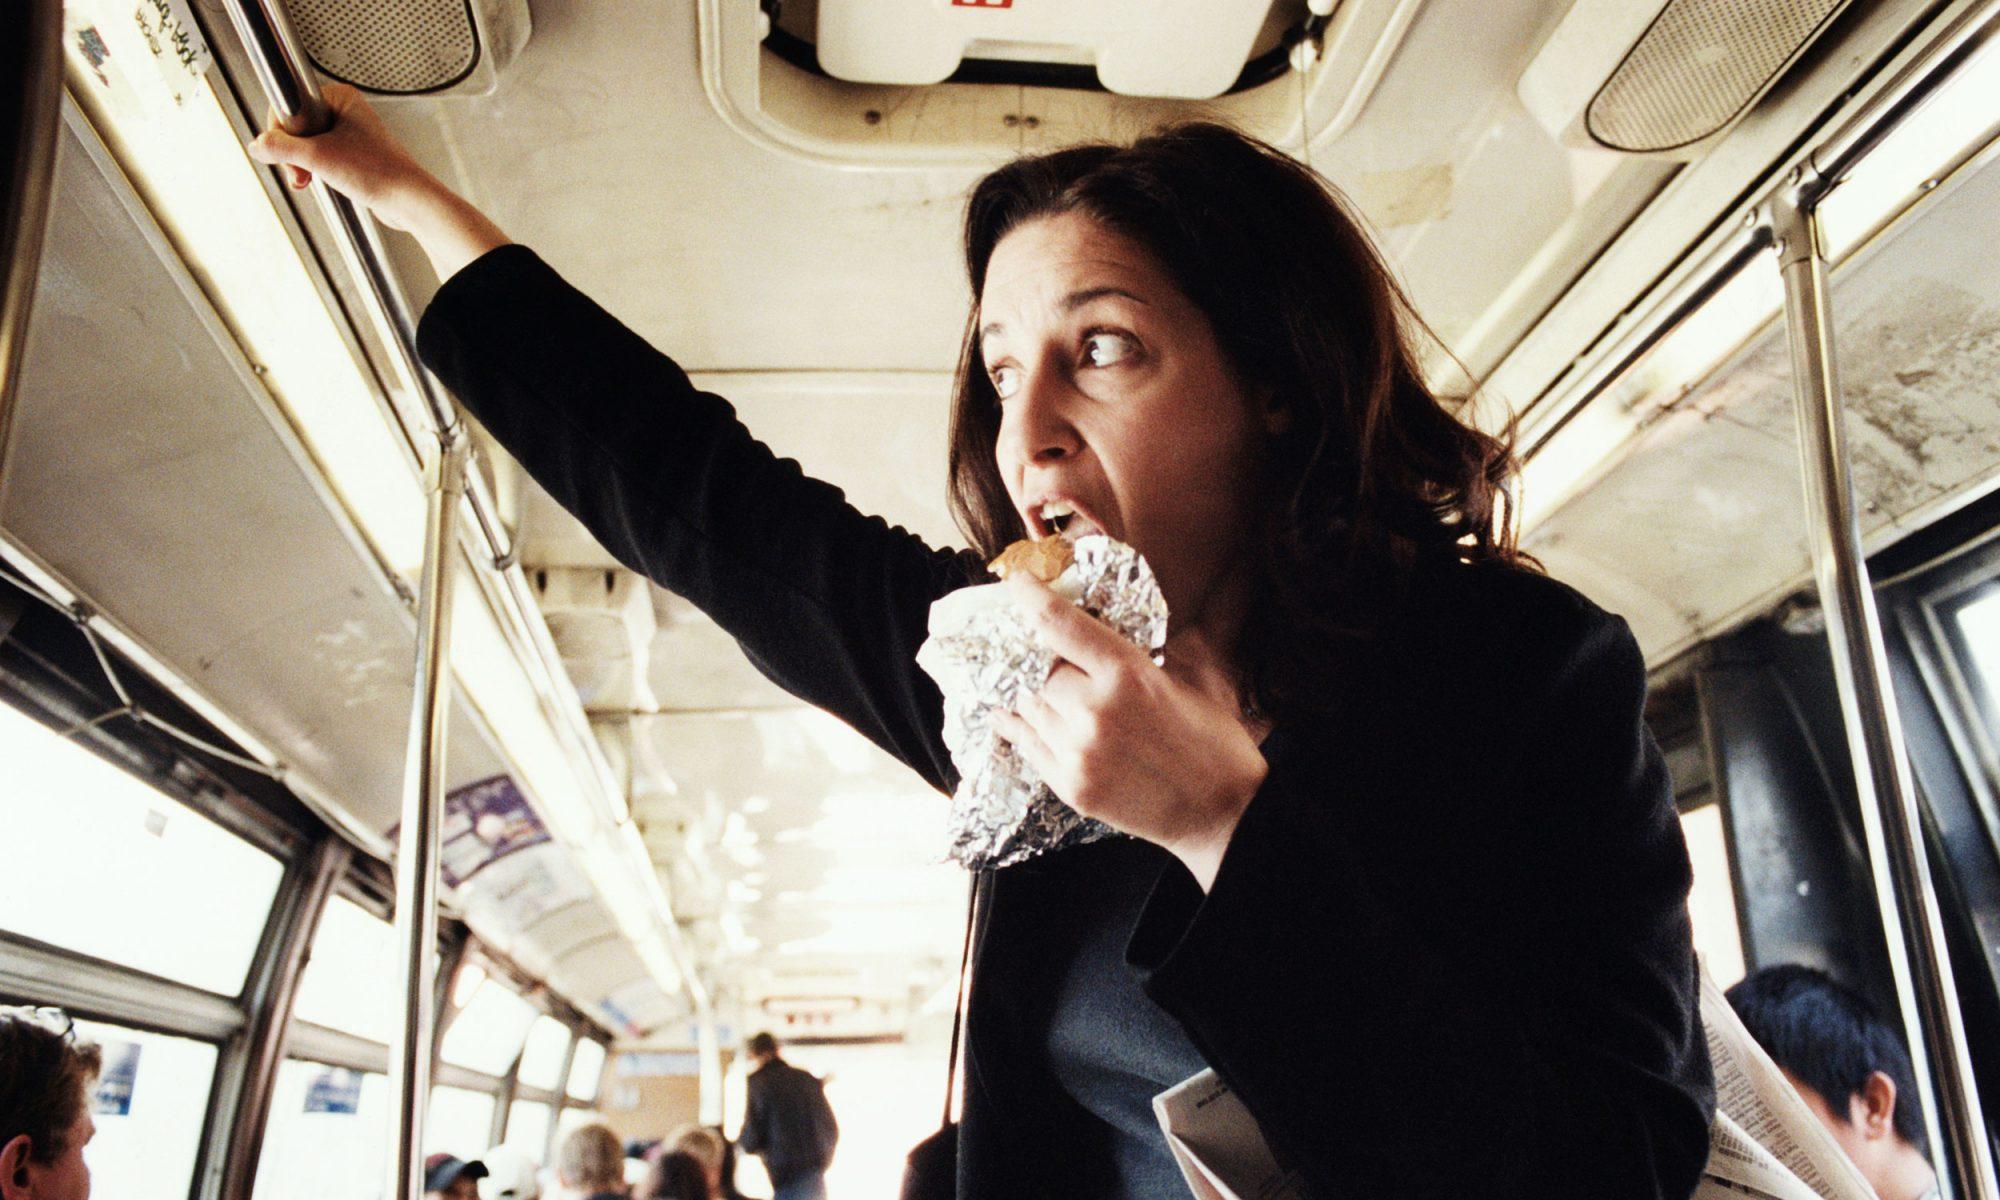 EC: Do Not Eat Your Yogurt on the Subway